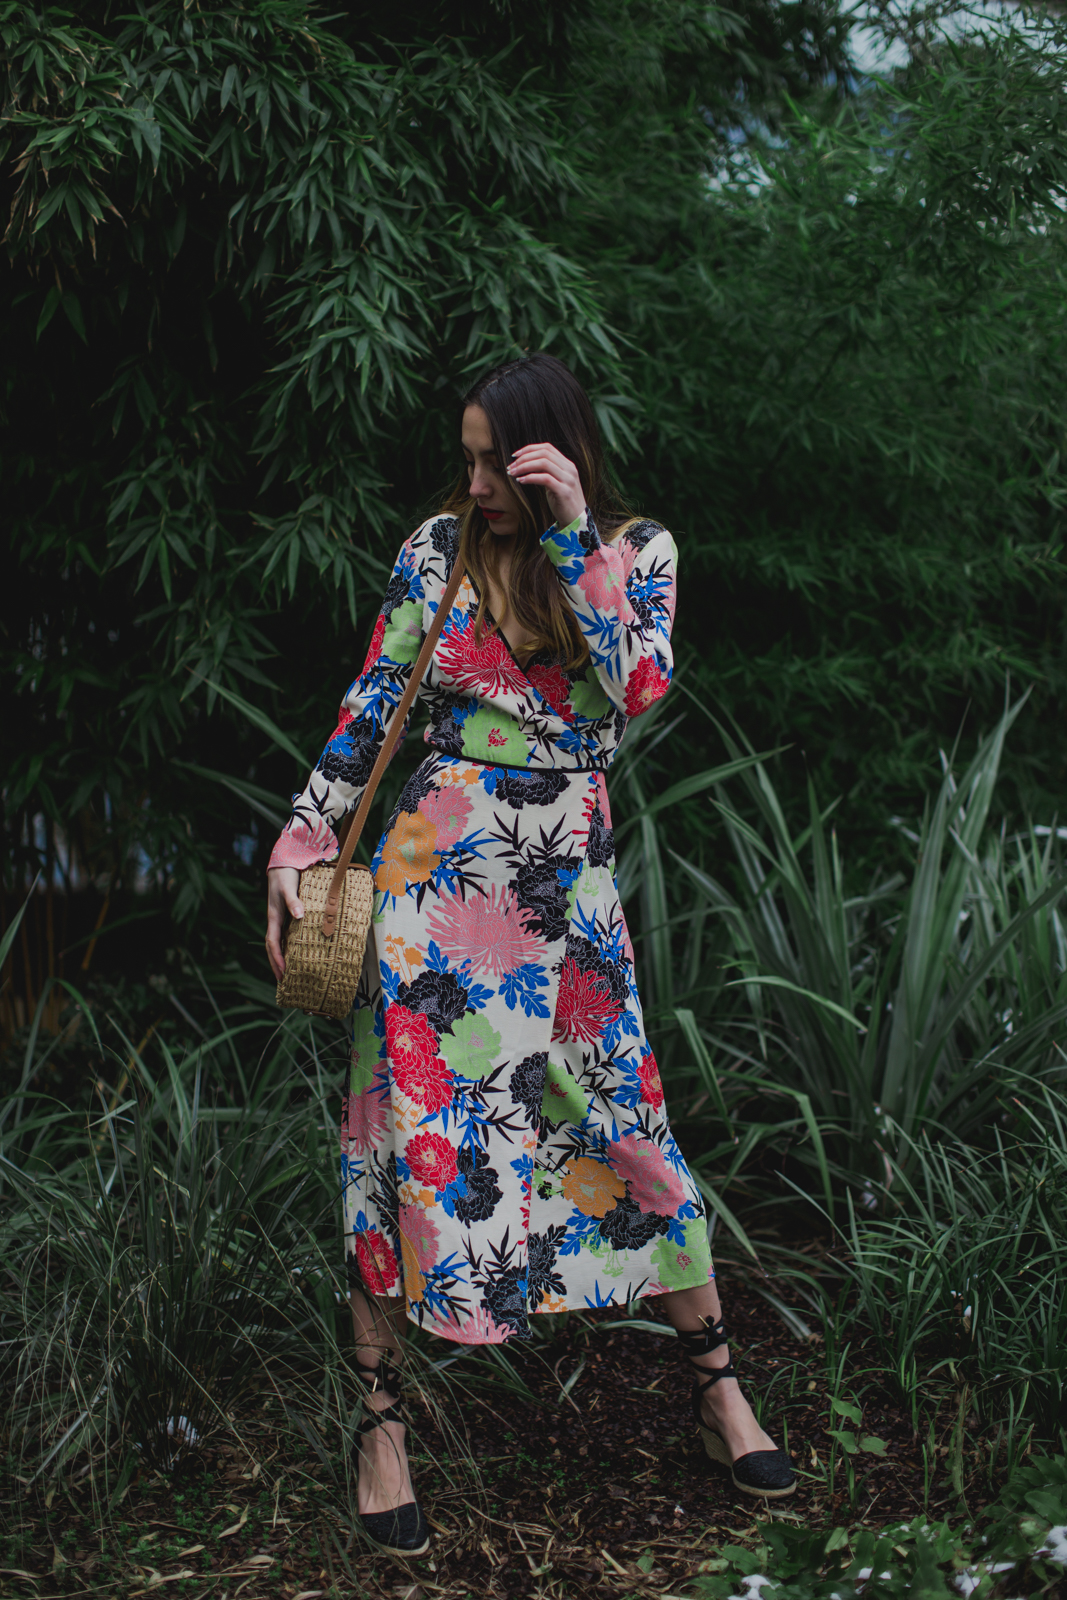 fashion-photographer-london-fashionstory-jasmina-haskovic-minas-planet-uk16.jpg